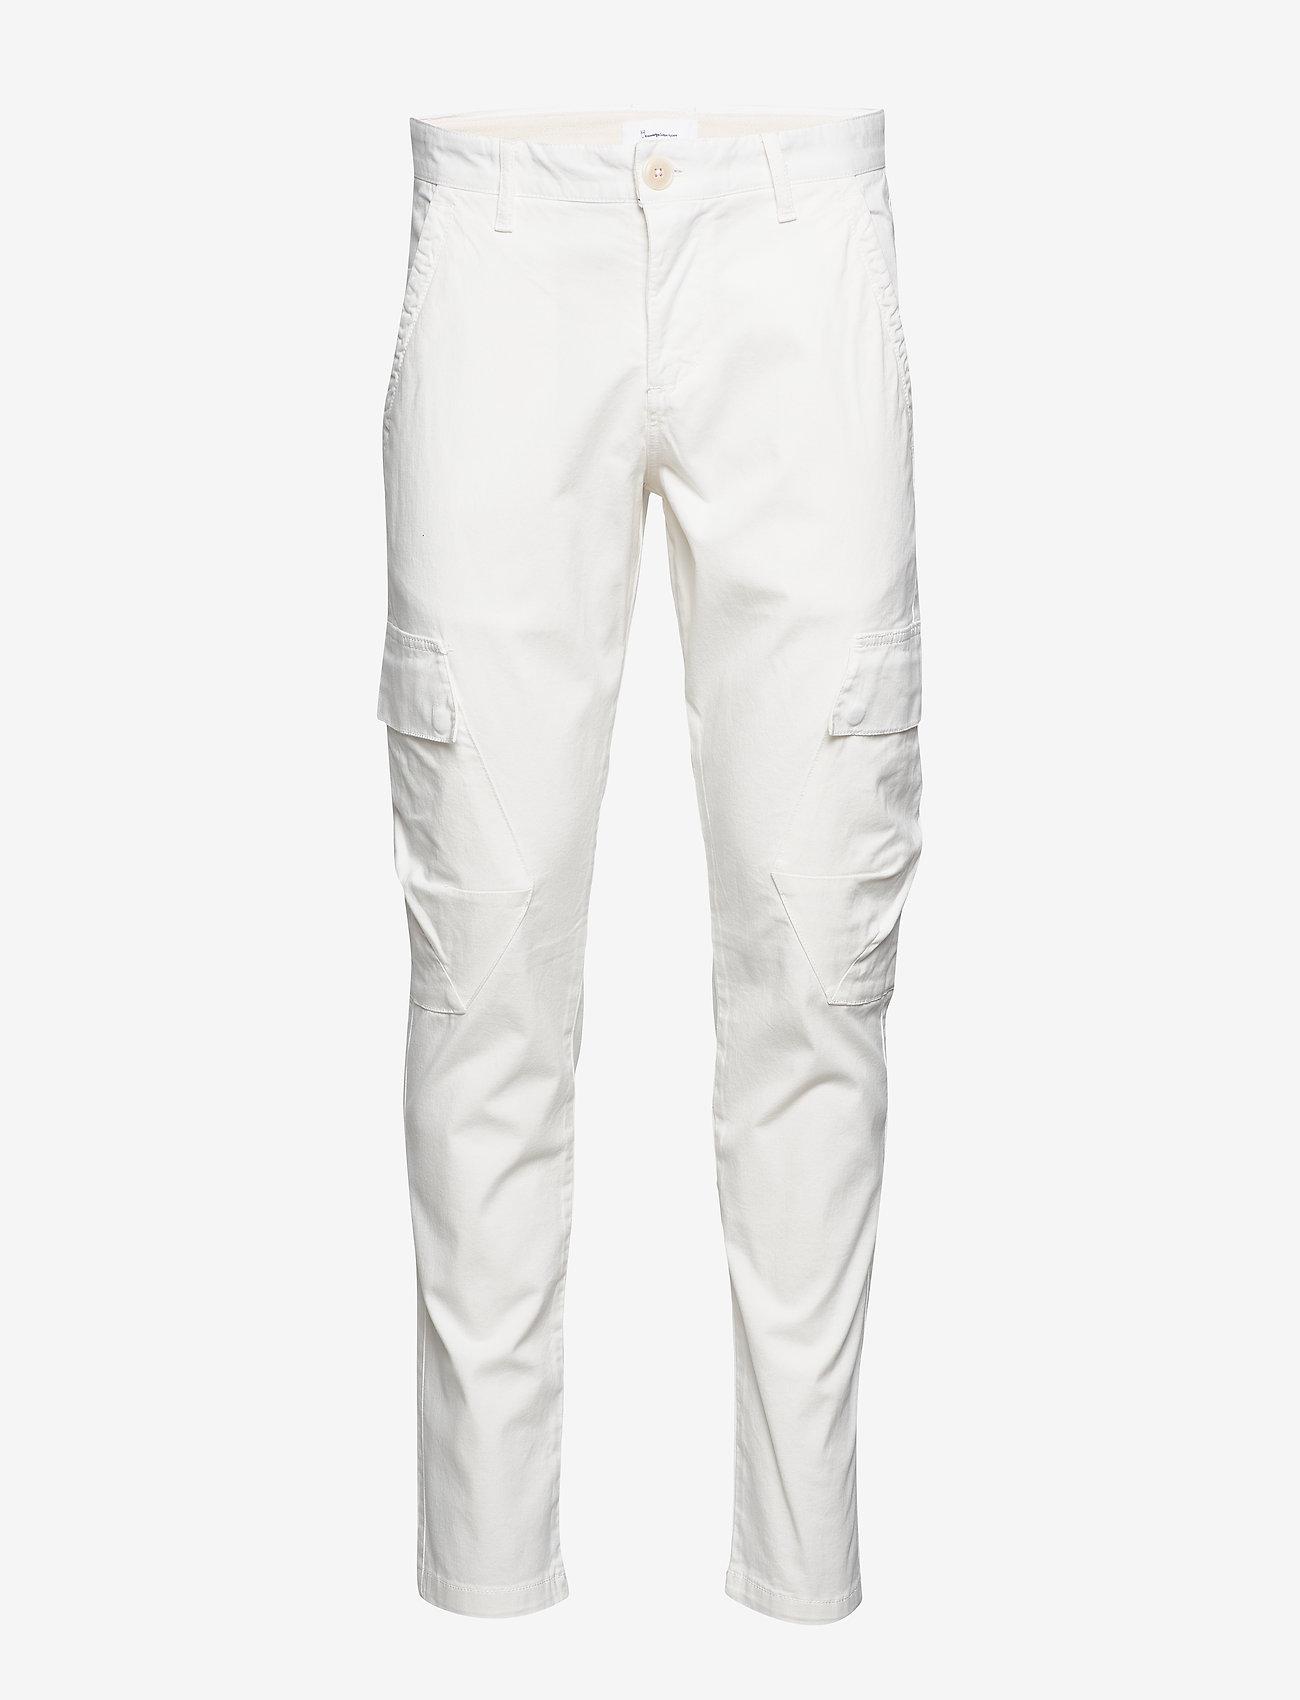 Knowledge Cotton Apparel - JOE trekking pant - GOTS/Vegan - cargobukser - star white - 0